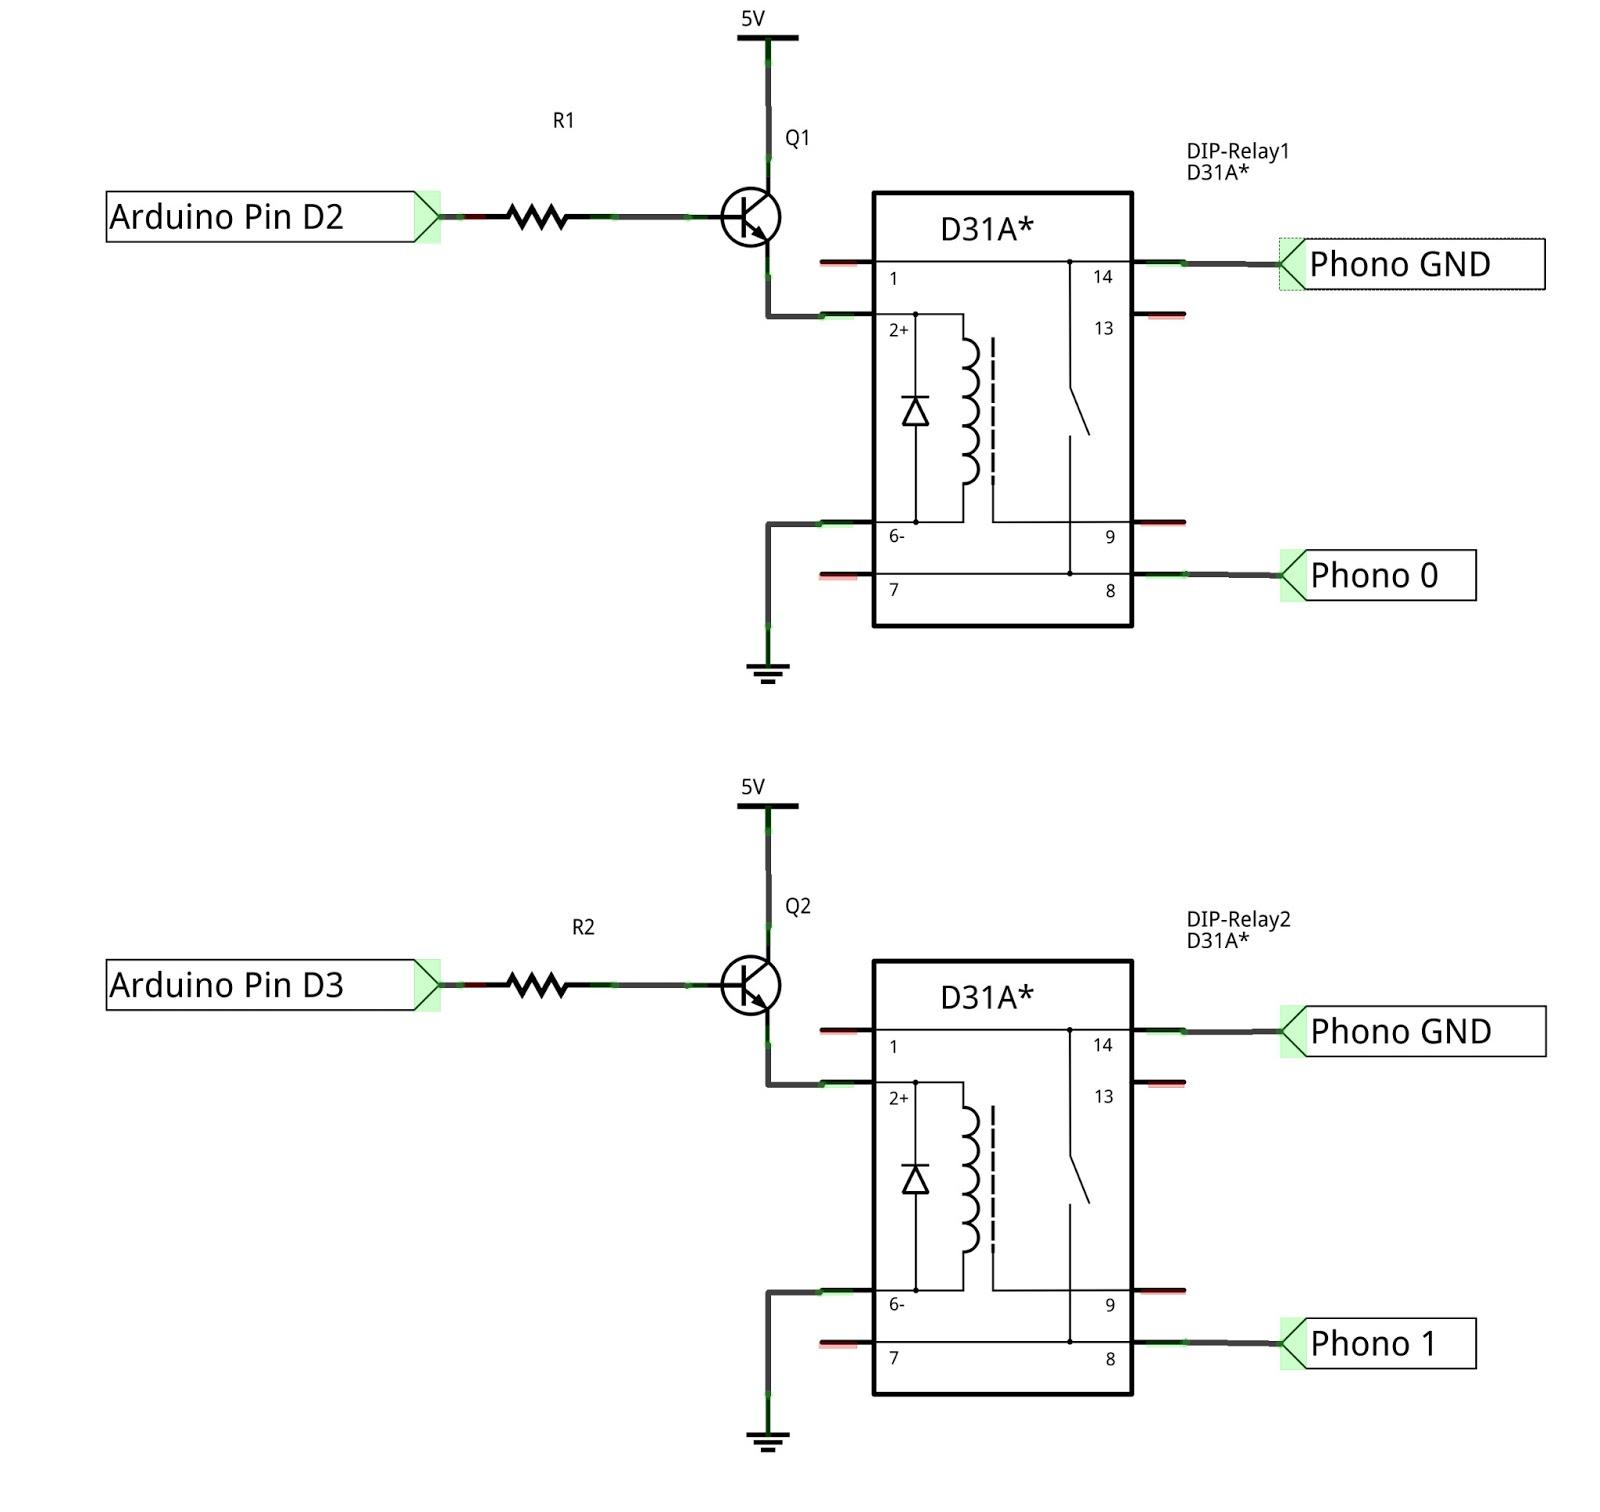 Arduino visual programming language